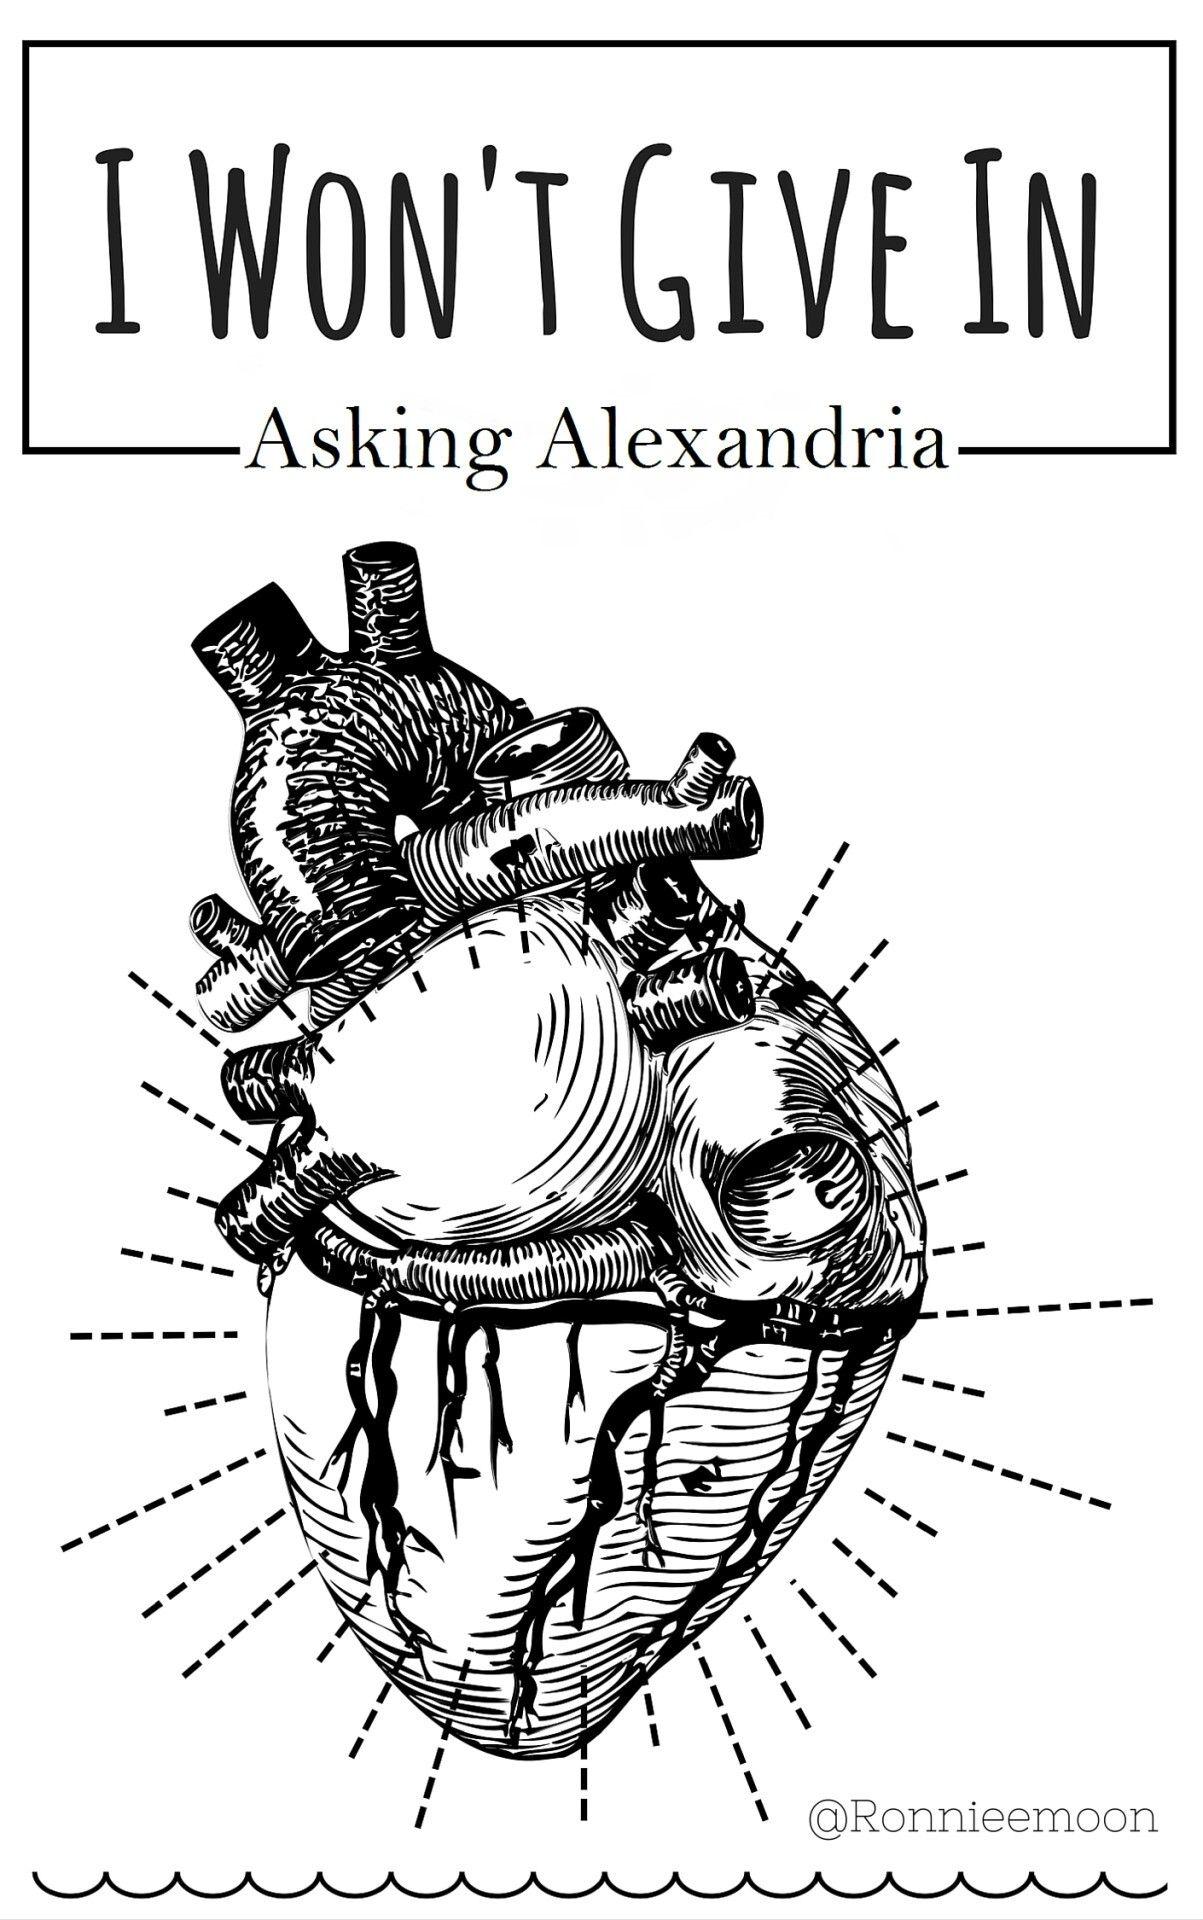 Asking Alexandria Lyrics Every Breath You Take I Watch